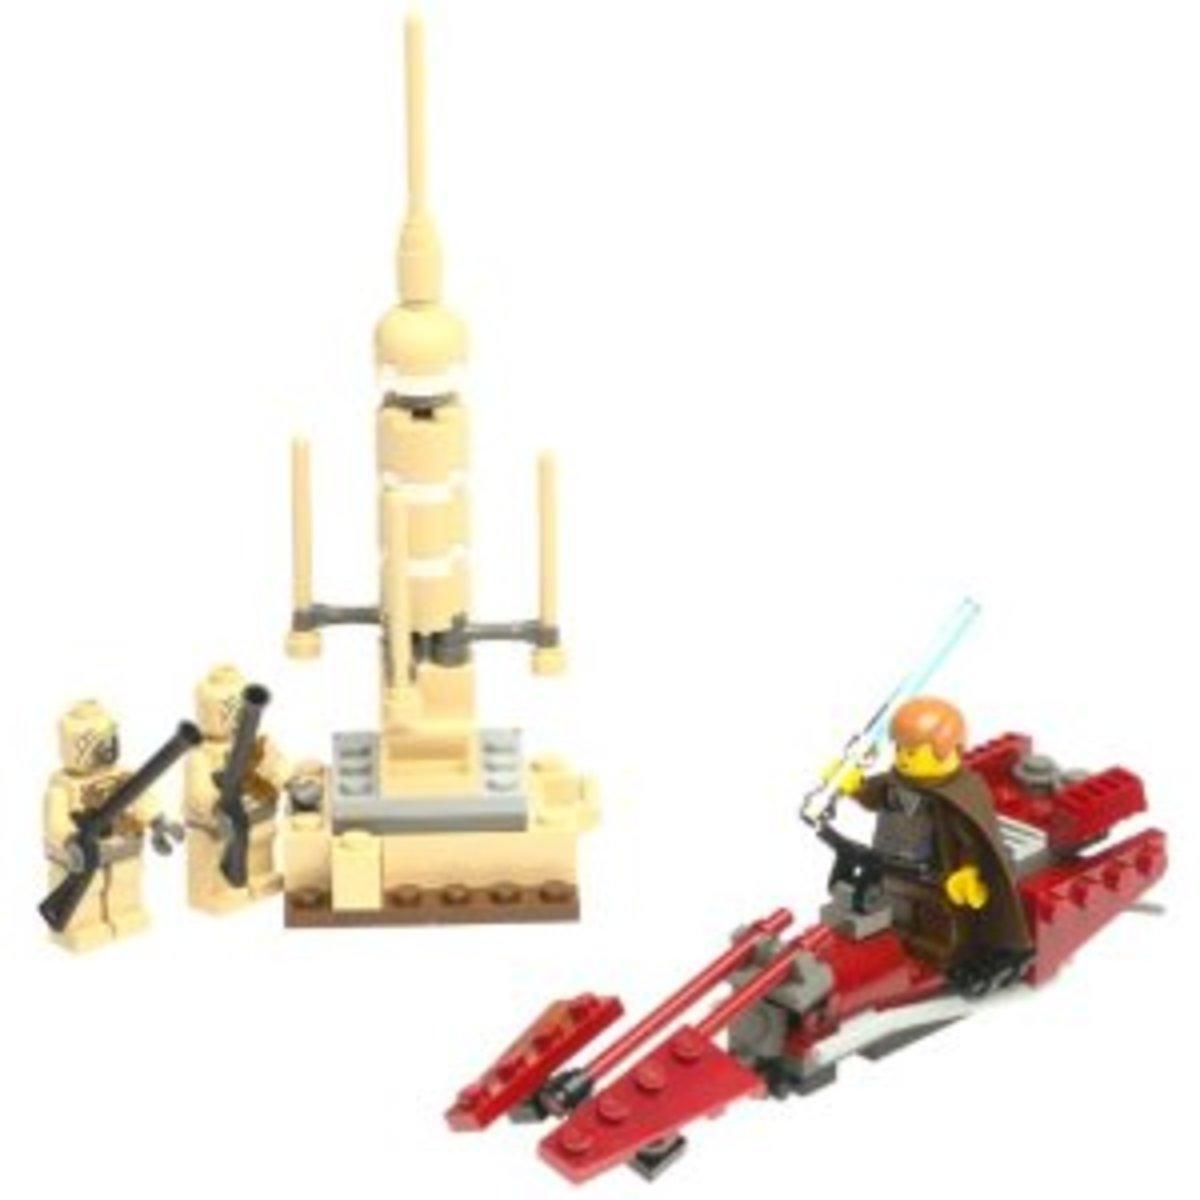 LEGO Star Wars Tusken Raider Encounter 7113 Assembled